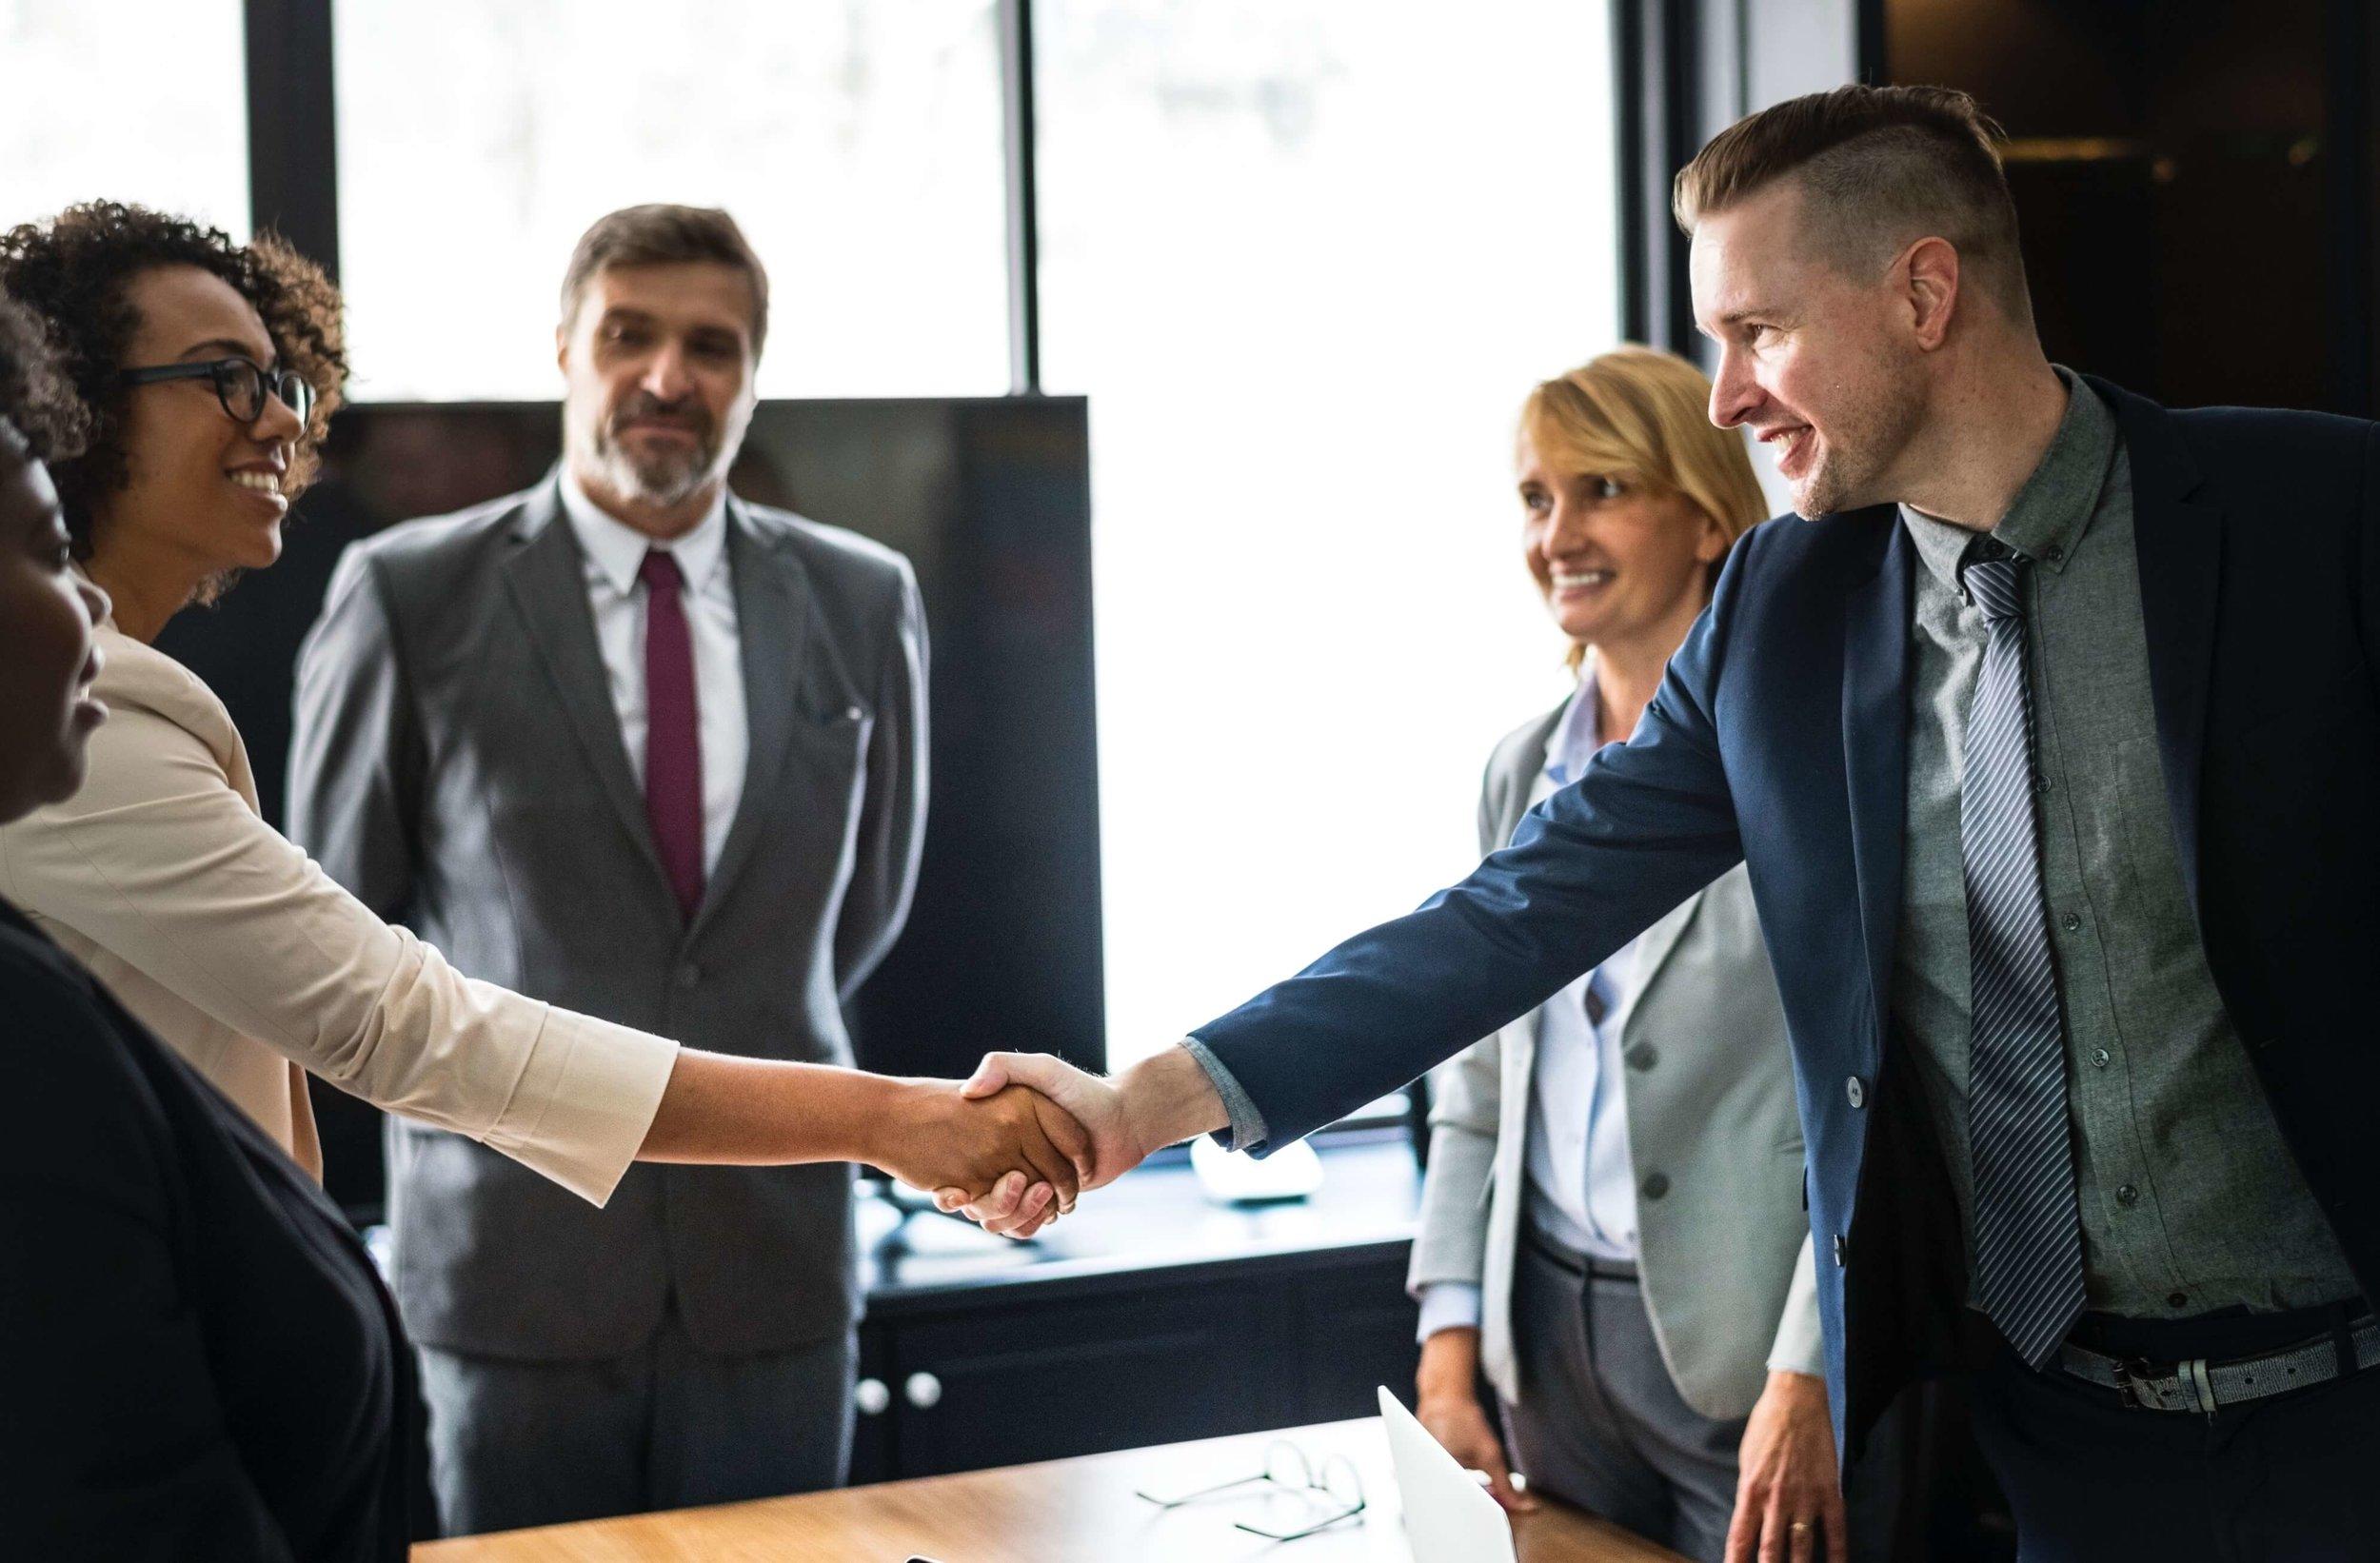 accomplishment-agreement-business-1249158(2).jpg